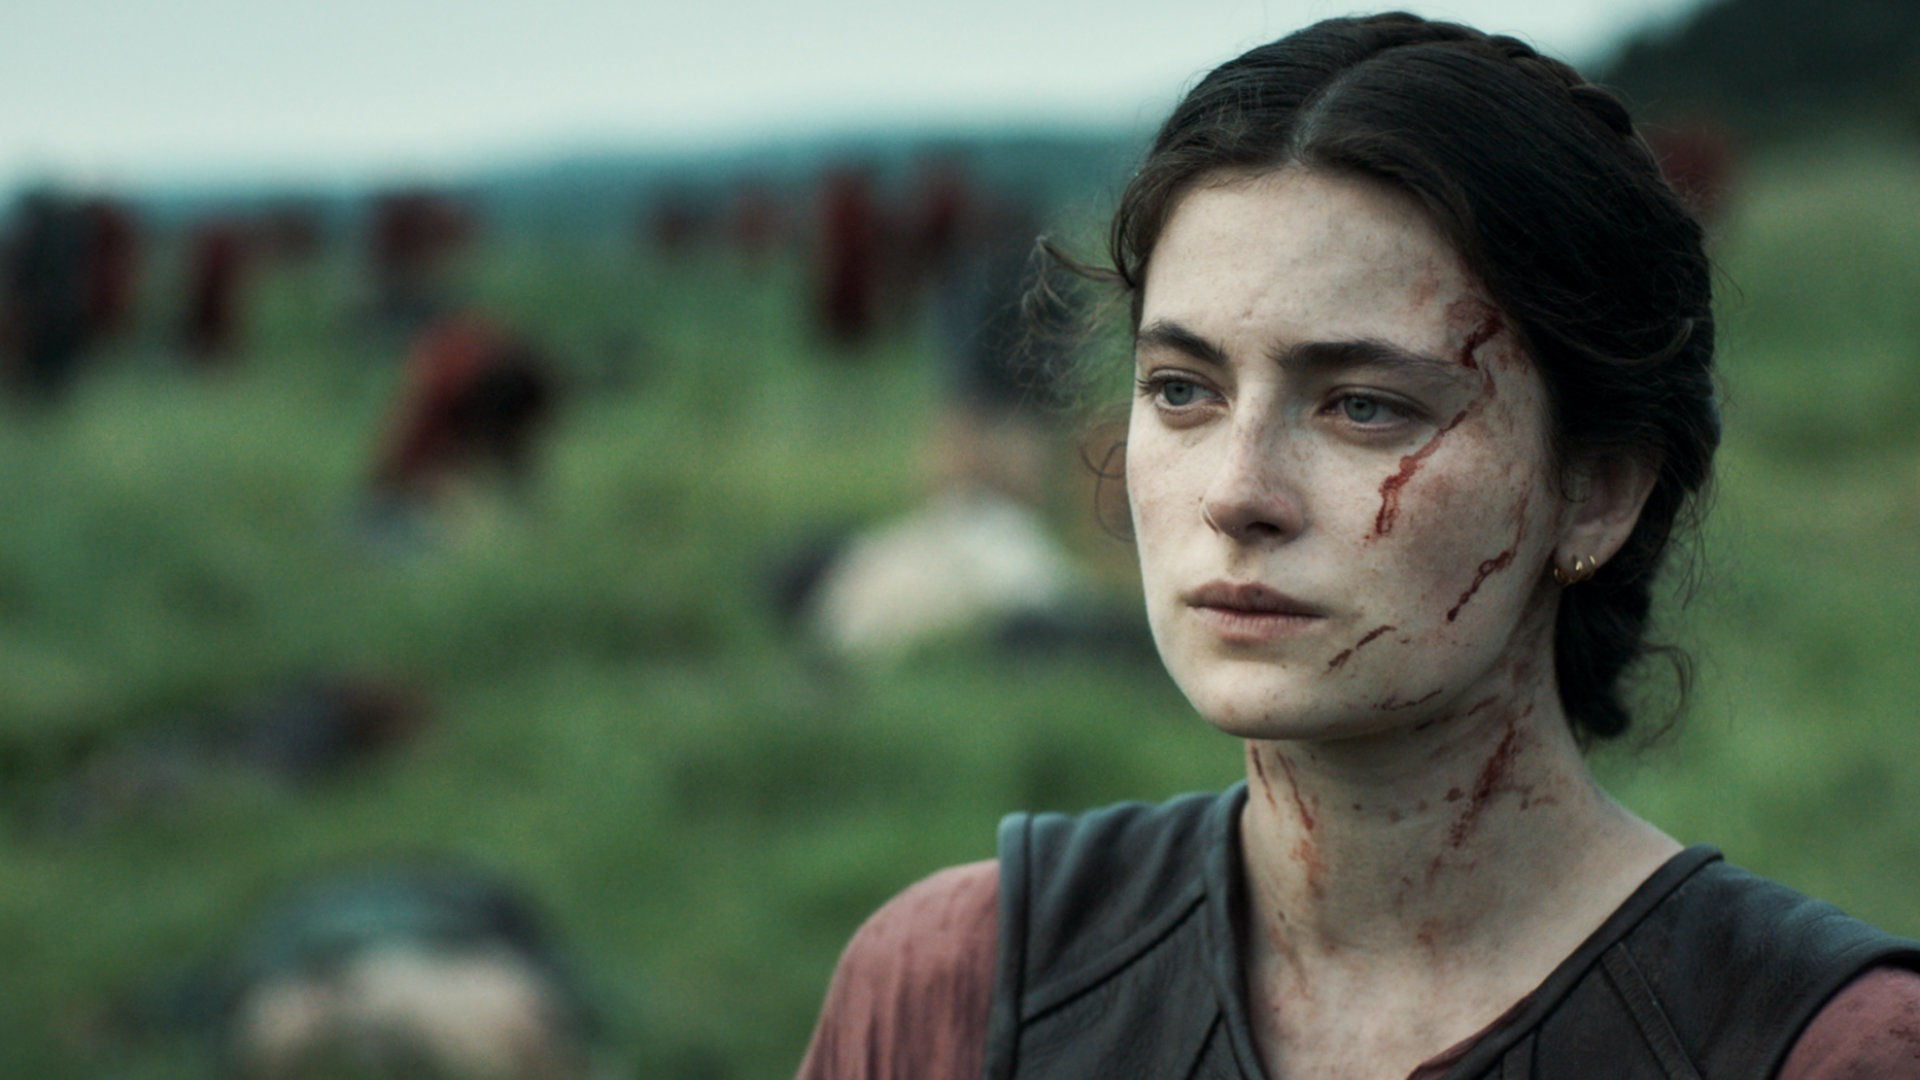 Aethelflaed (Millie Brady) em The Last Kingdom.